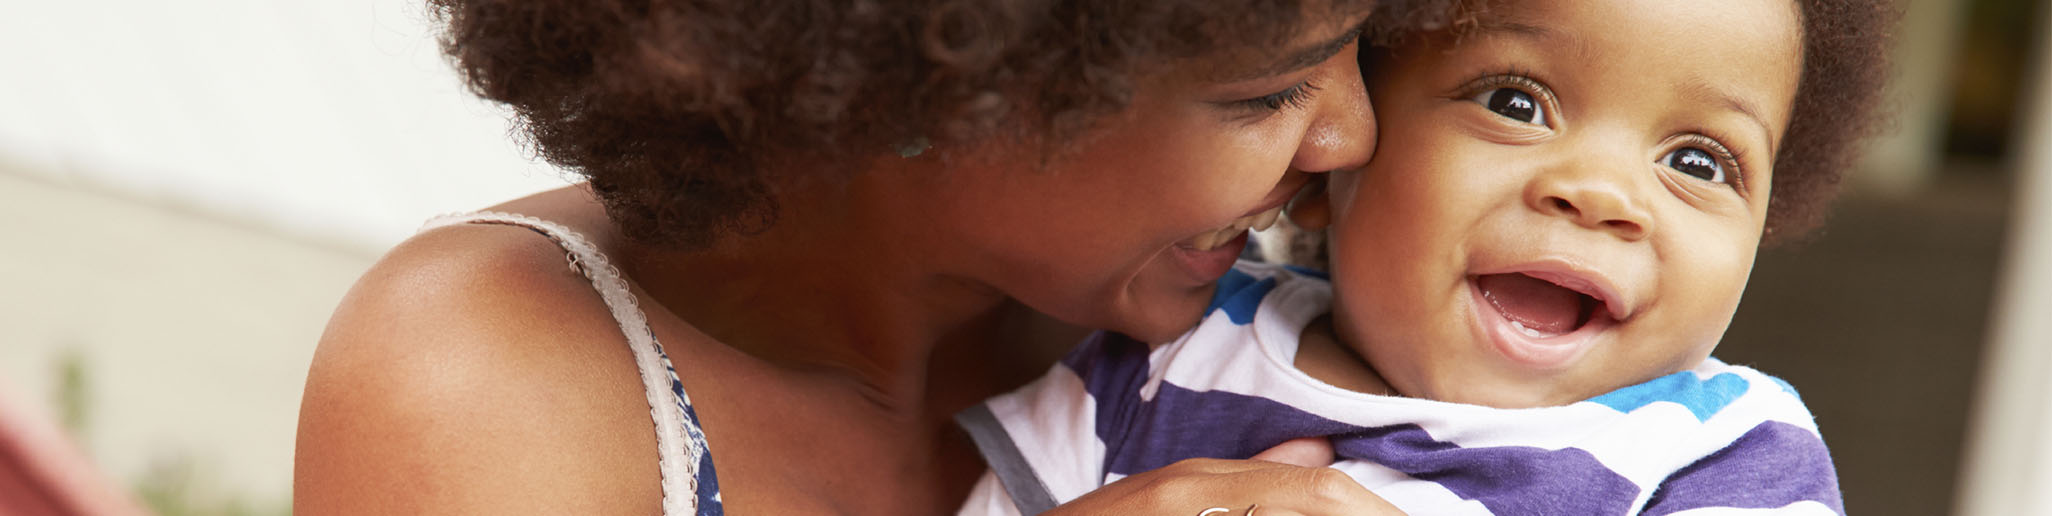 Homepage banner for Healthy U Medicaid Plan